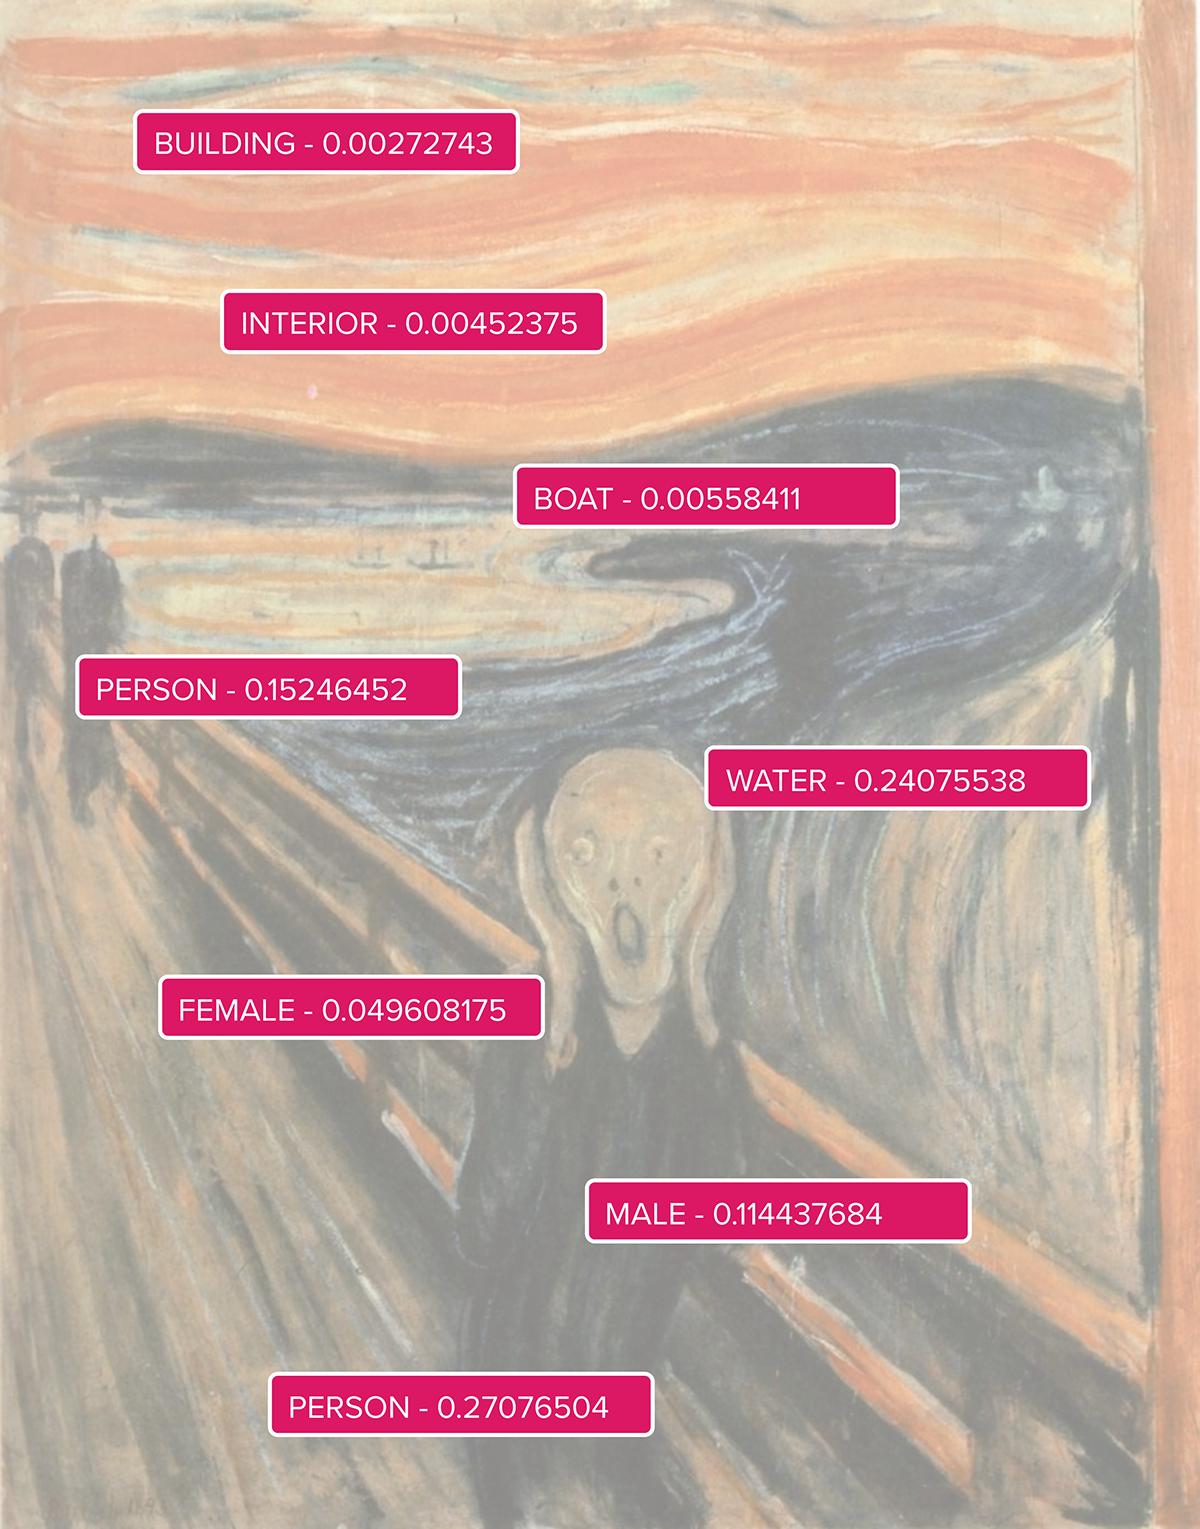 Munch_Scream_Machine_Learning.png